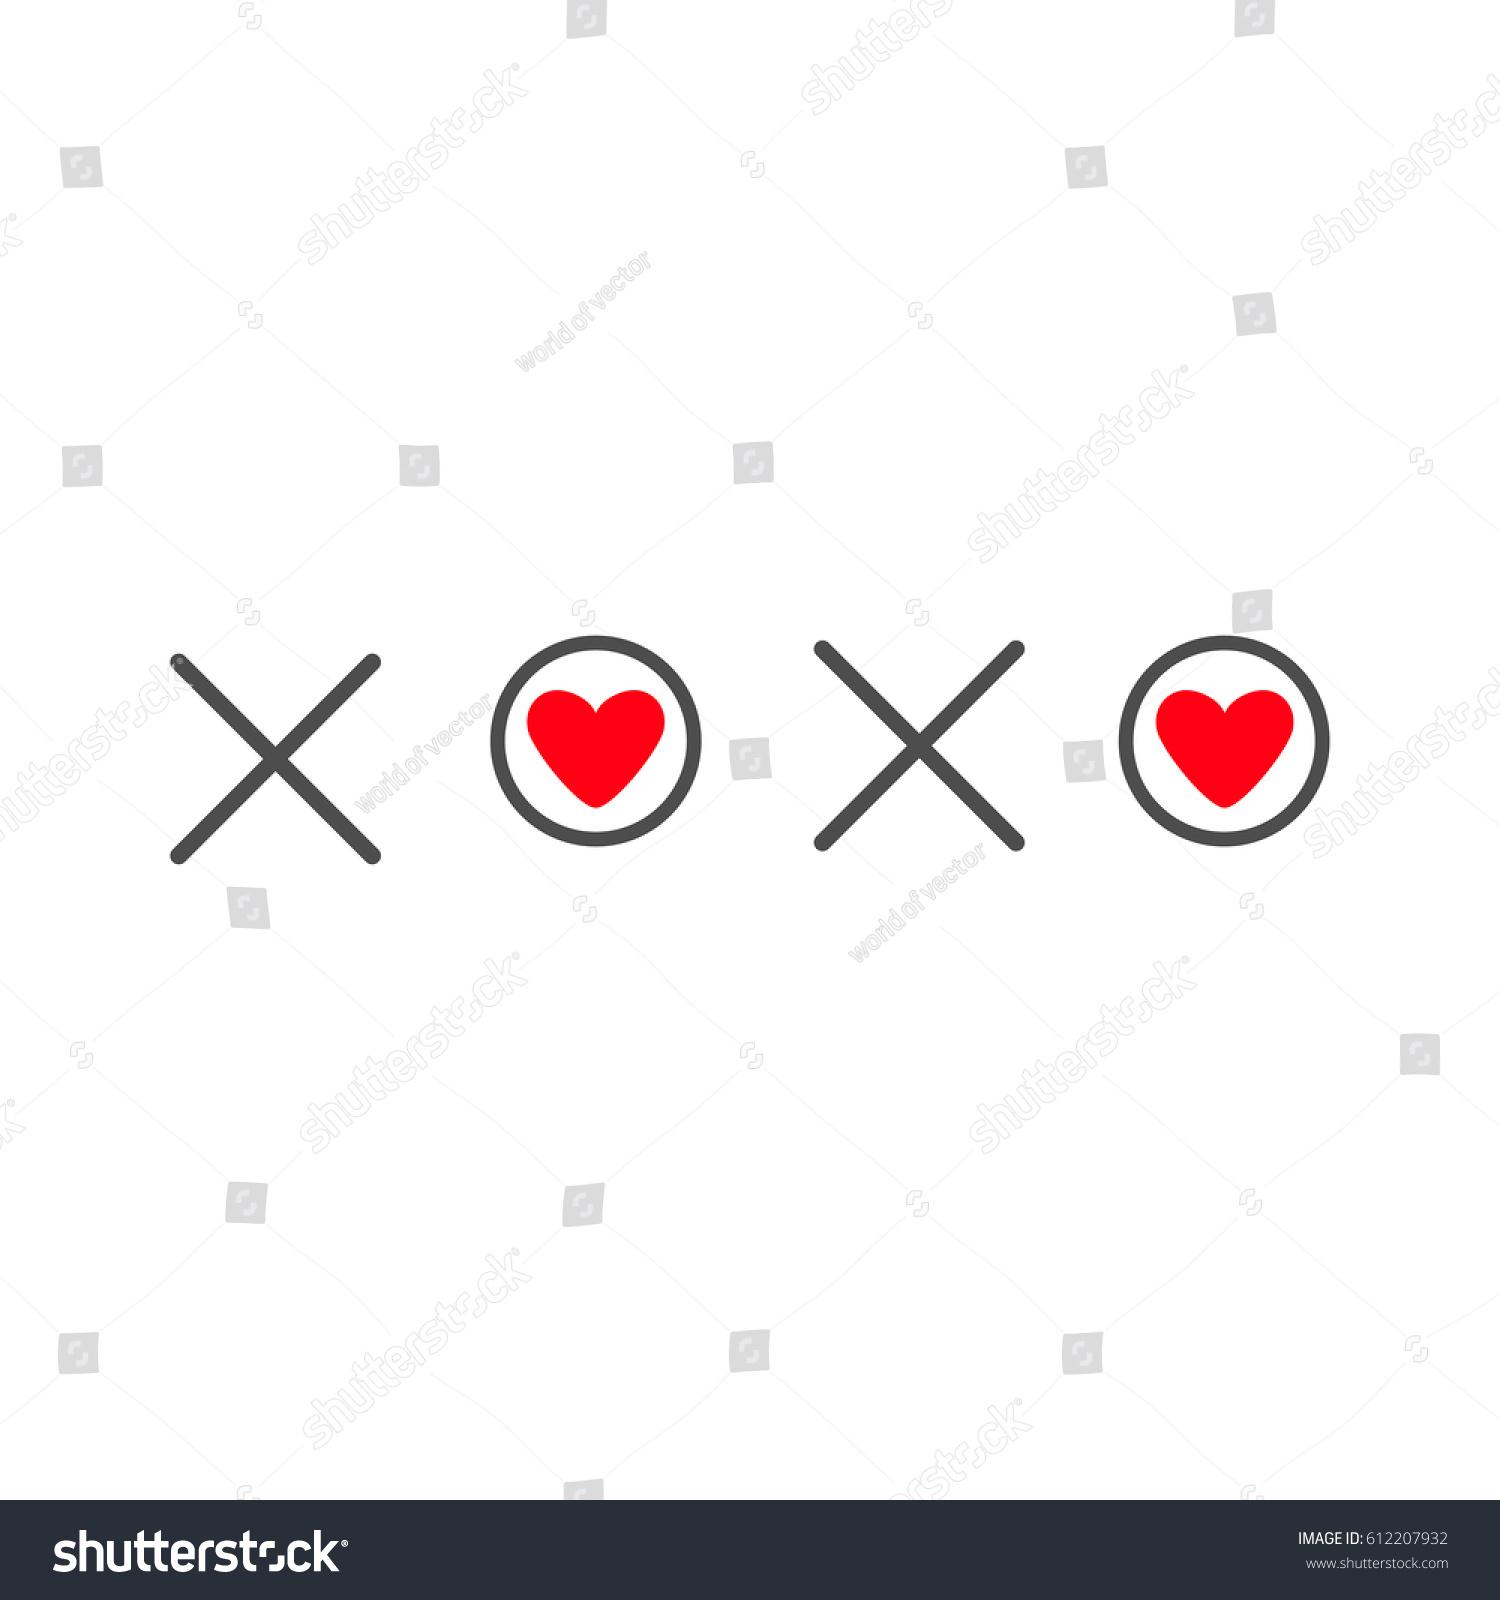 Xoxo Hugs Kisses Sign Symbol Mark Stock Illustration 612207932